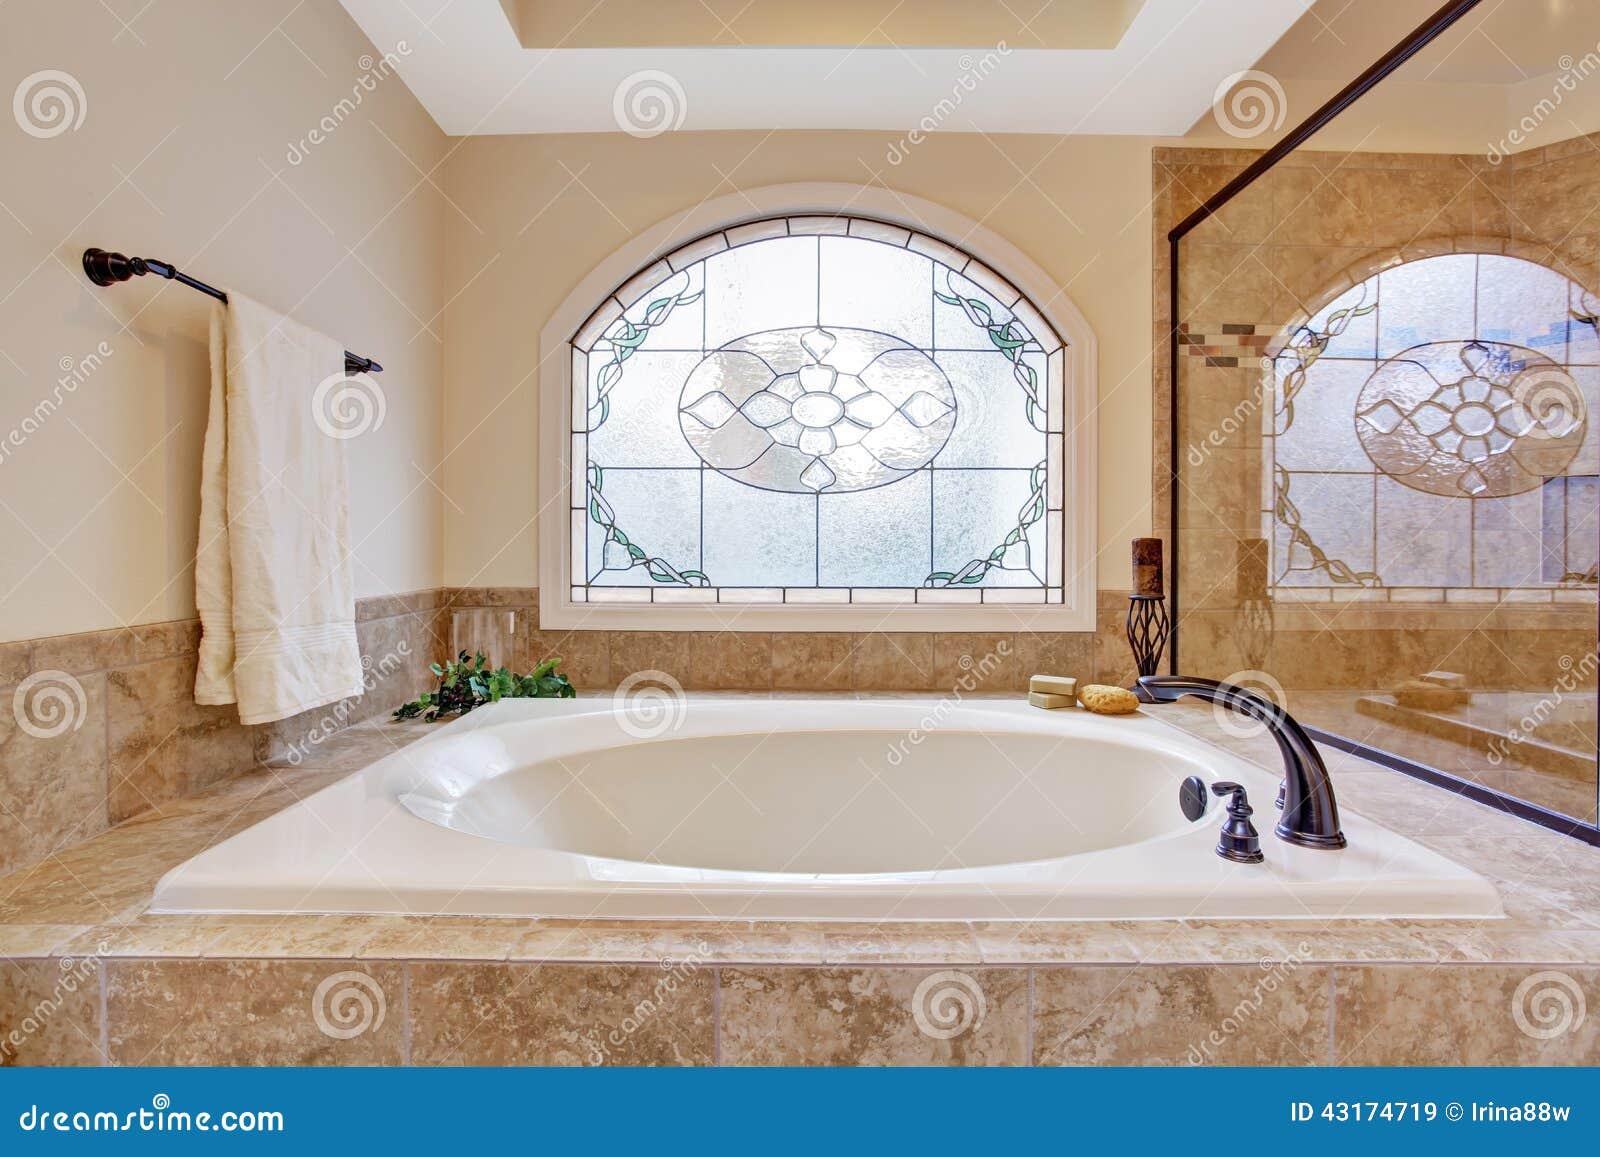 Bella Vasca Da Bagno In Bagno Di Lusso Immagine Stock - Immagine di ...